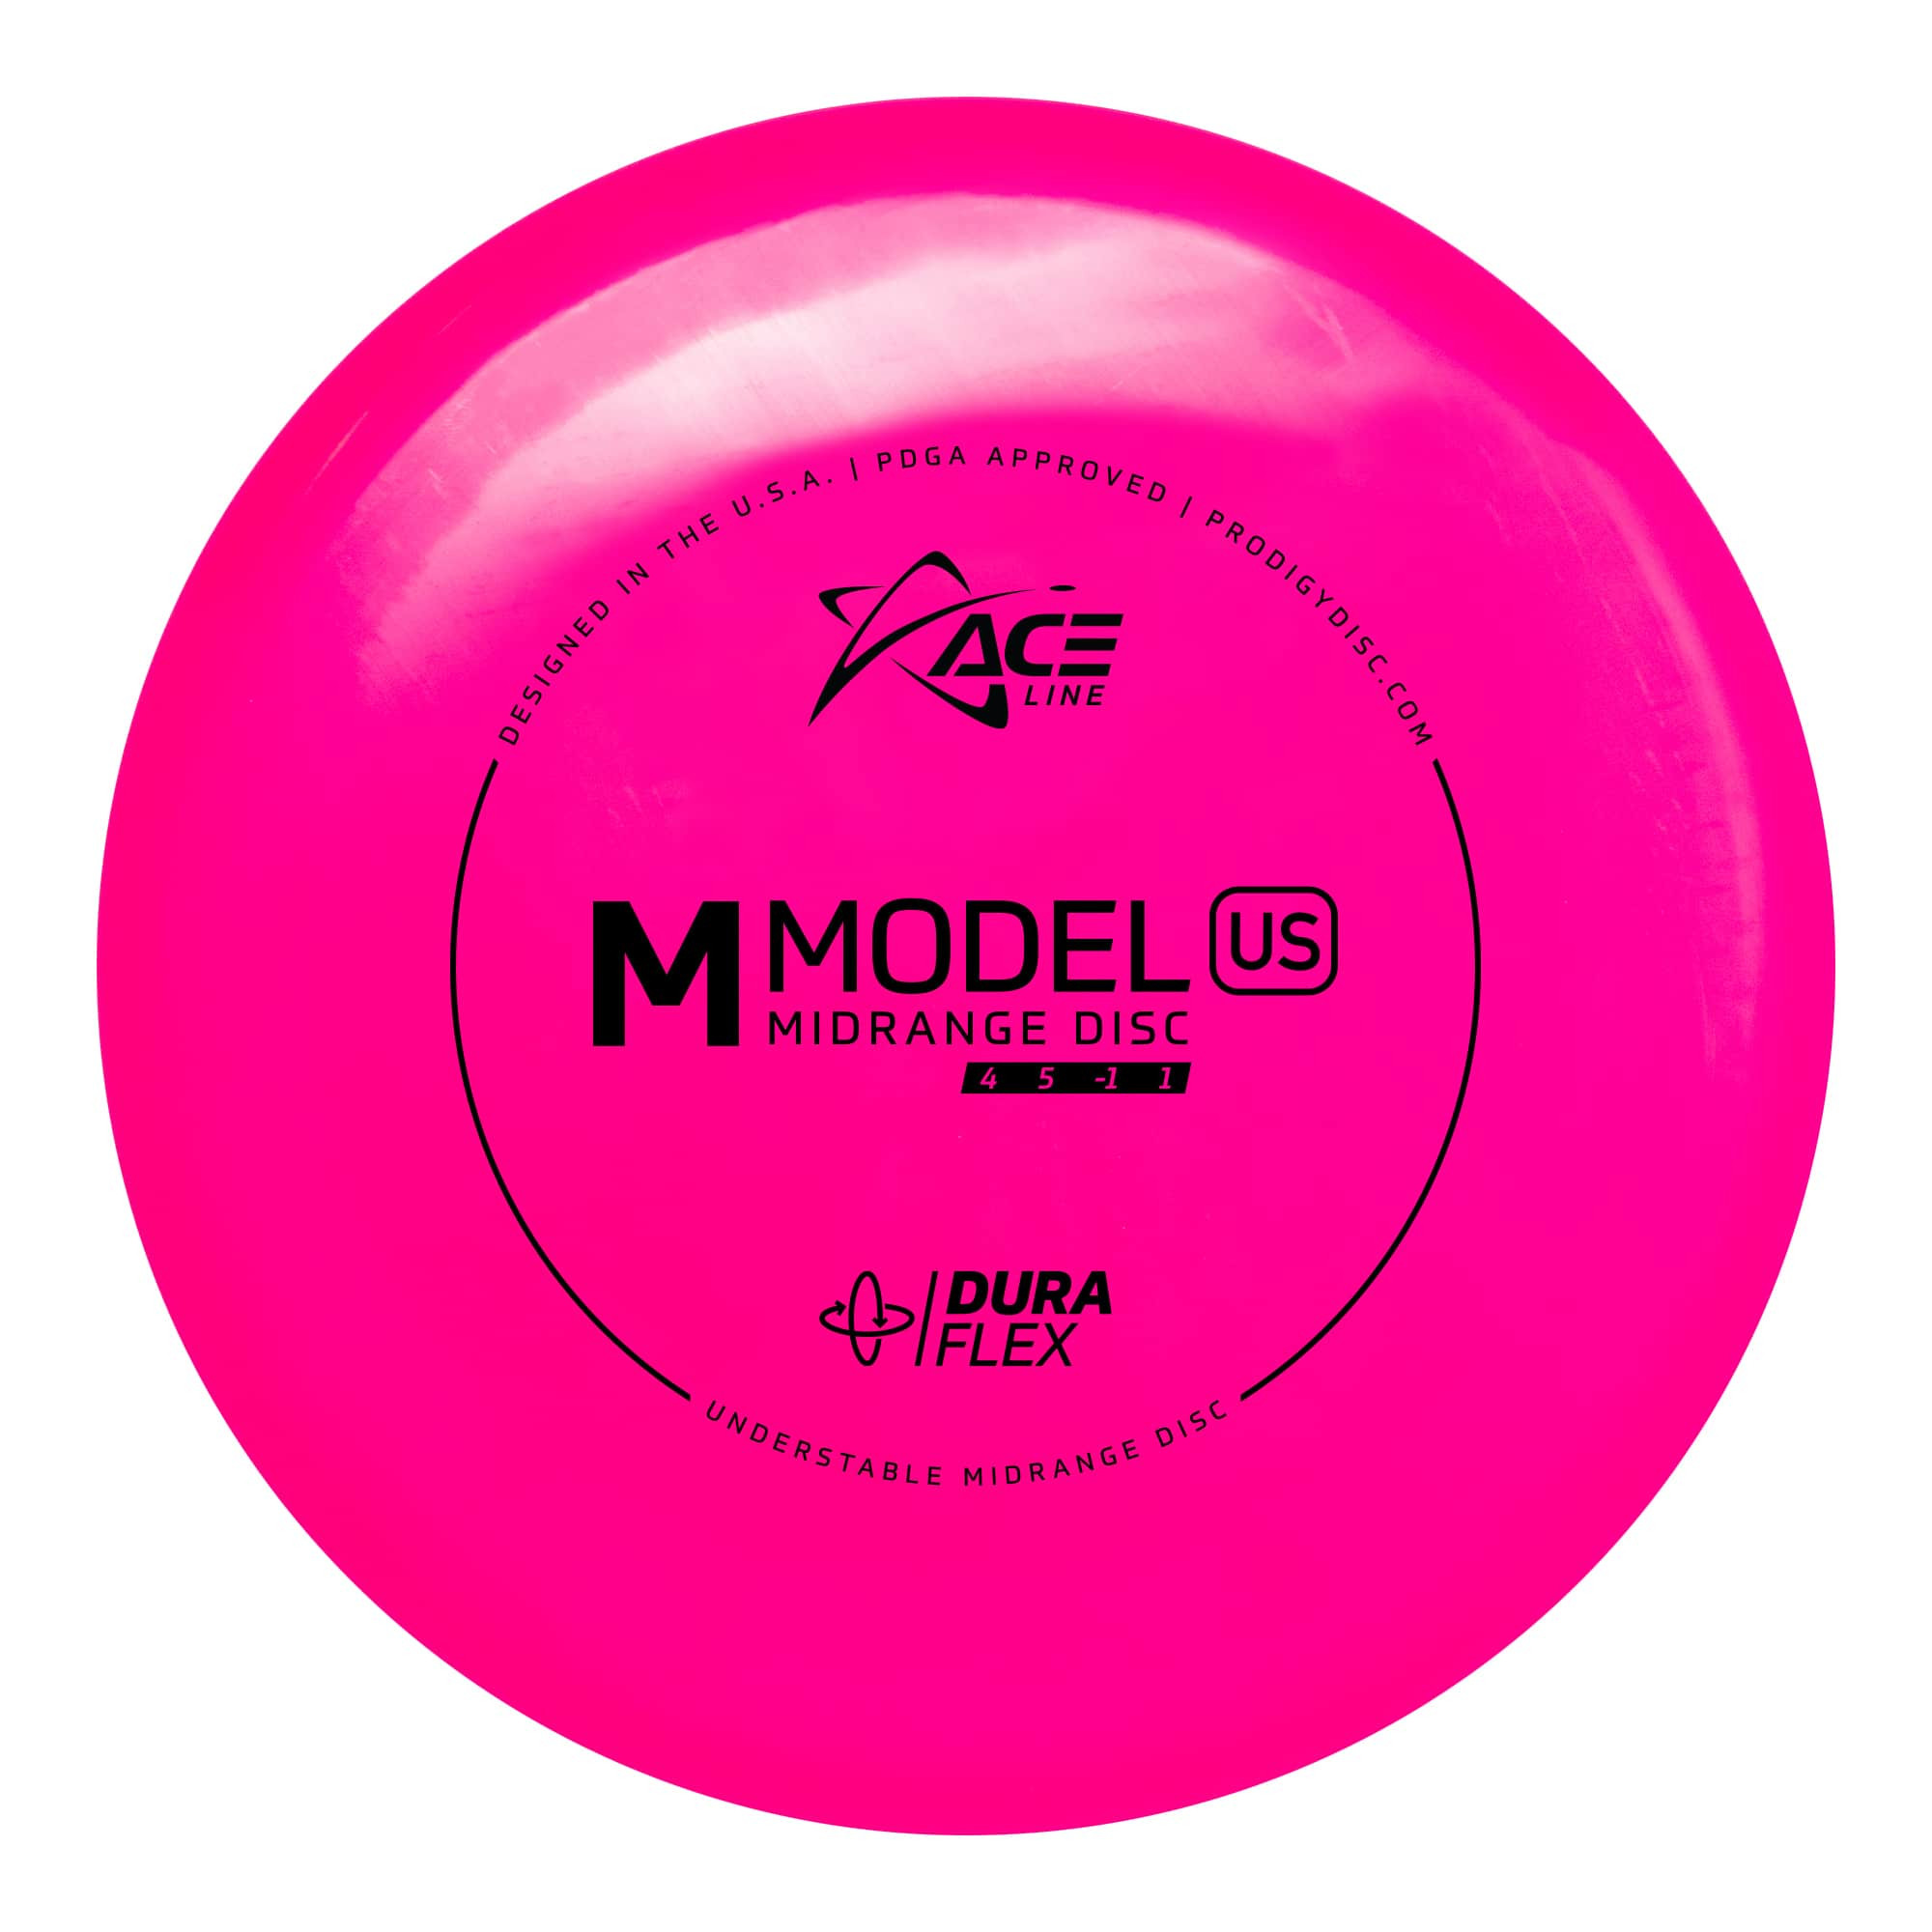 Prodigy Ace Line M Model US